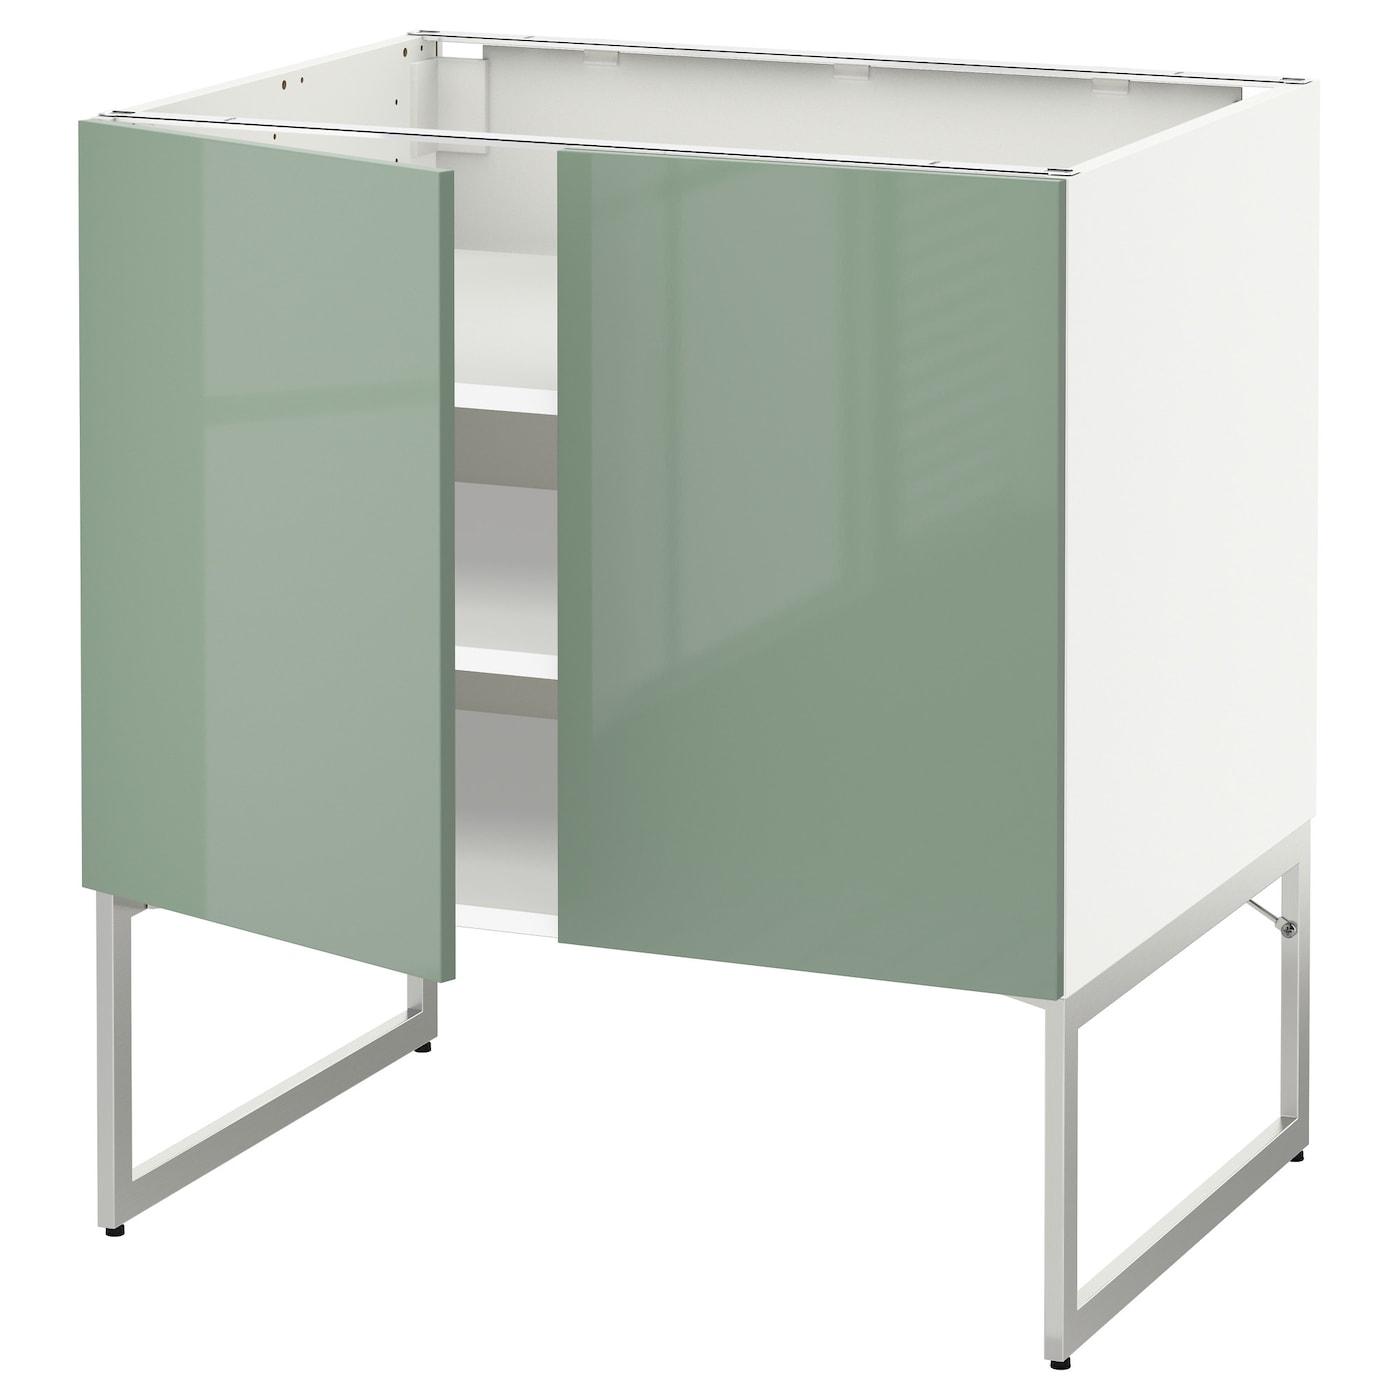 Ikea Kitchen Cabinet Construction: METOD Base Cabinet With Shelves/2 Doors White/kallarp